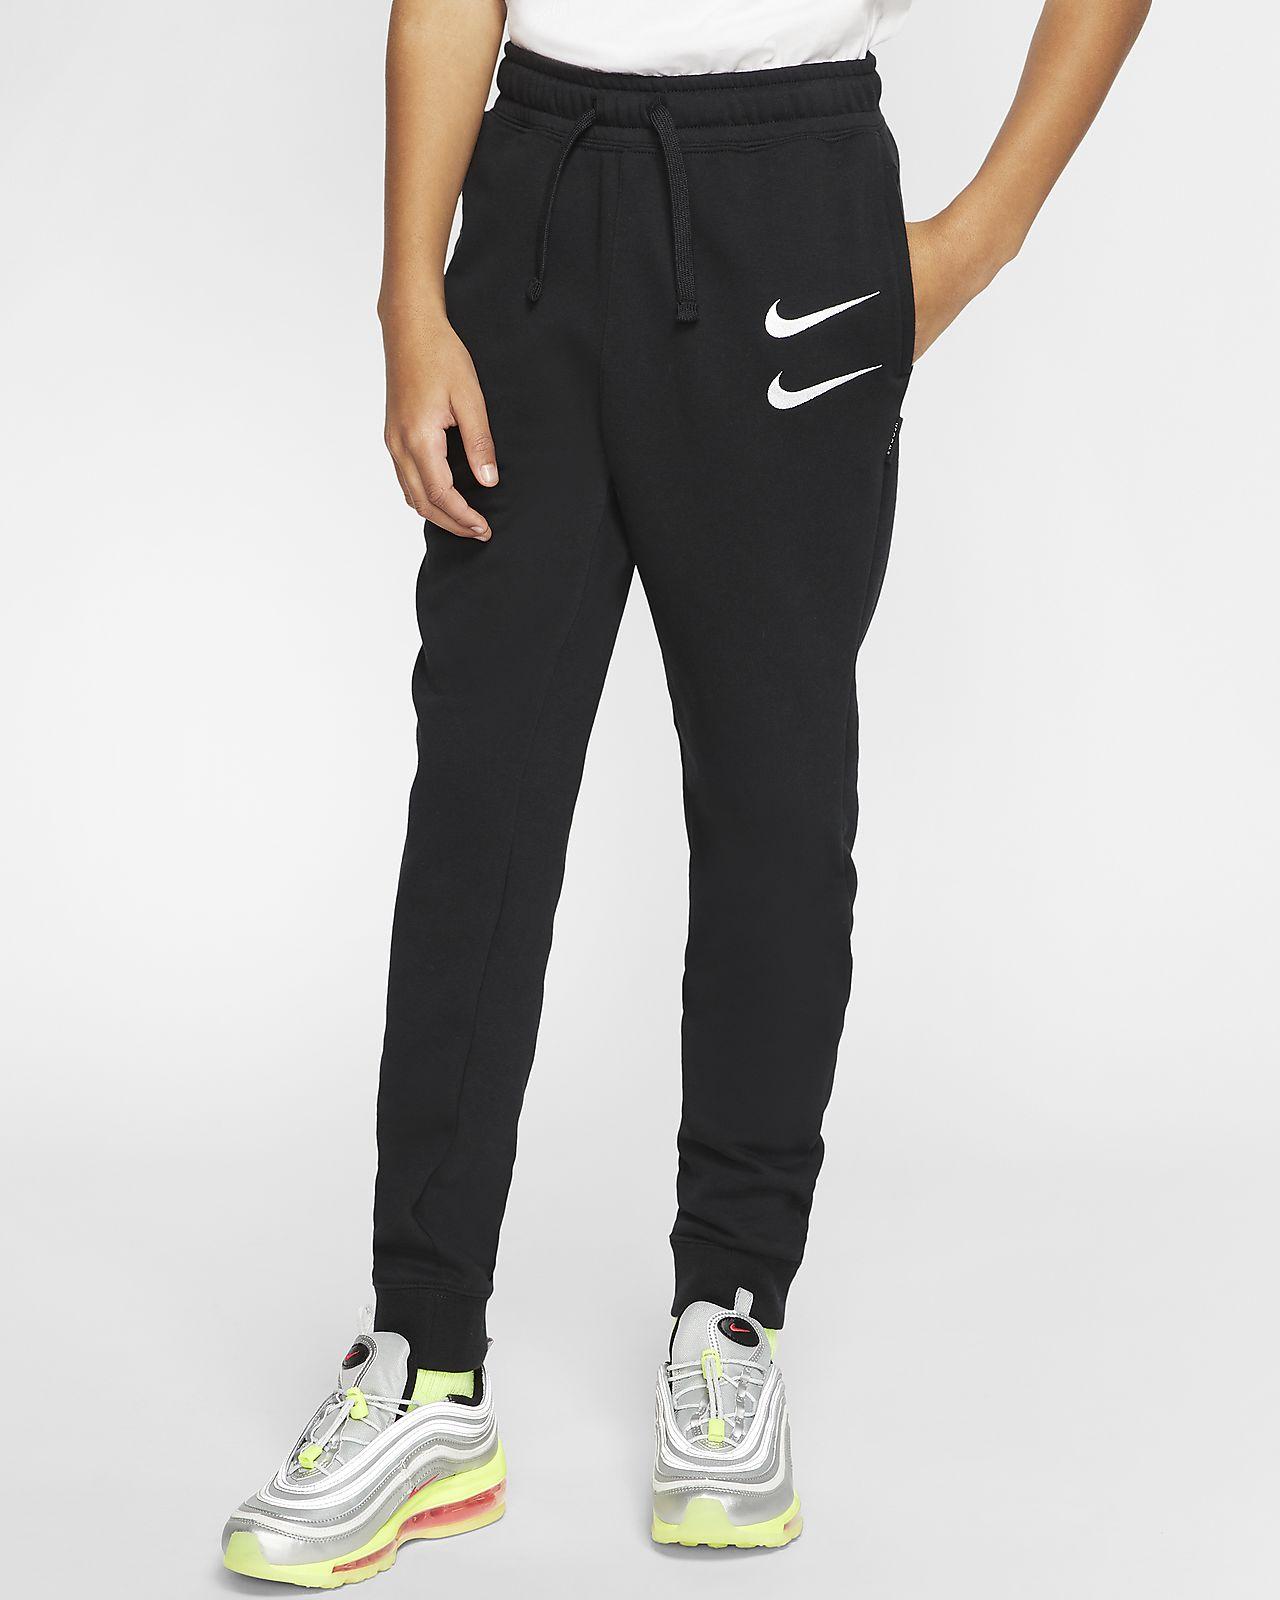 survetement nike air max,Nike international pantalon de surv